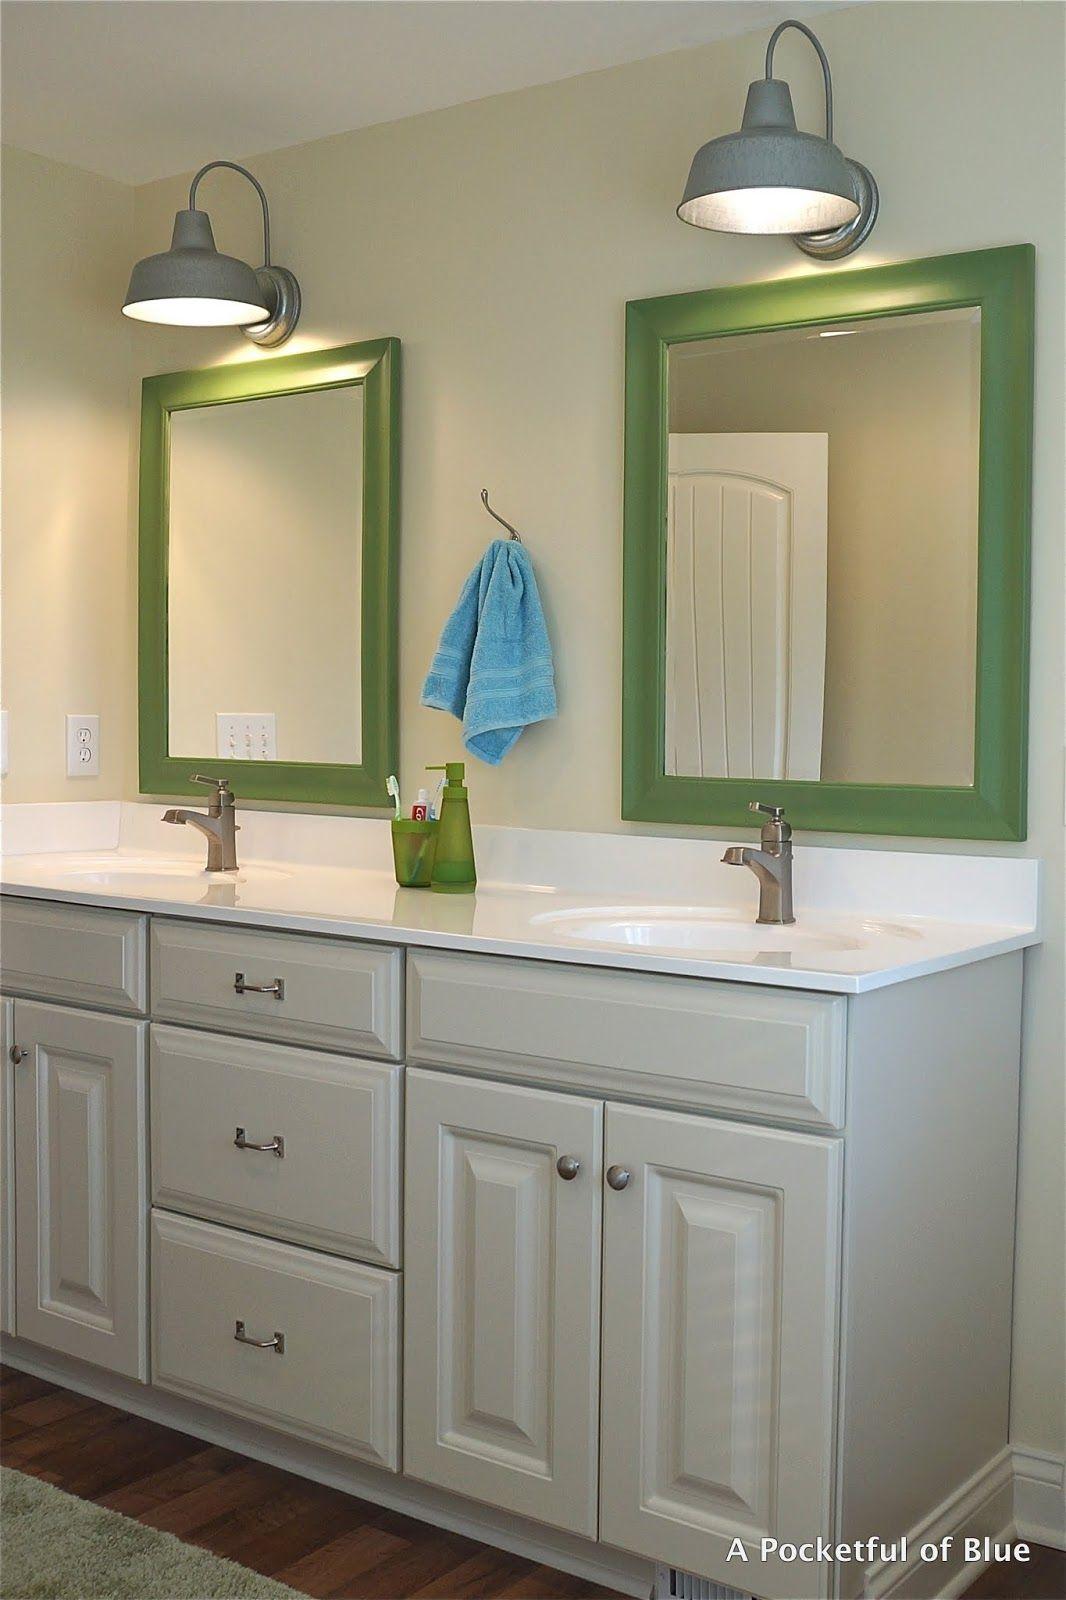 Must Love Junk Best Bathroom Lighting